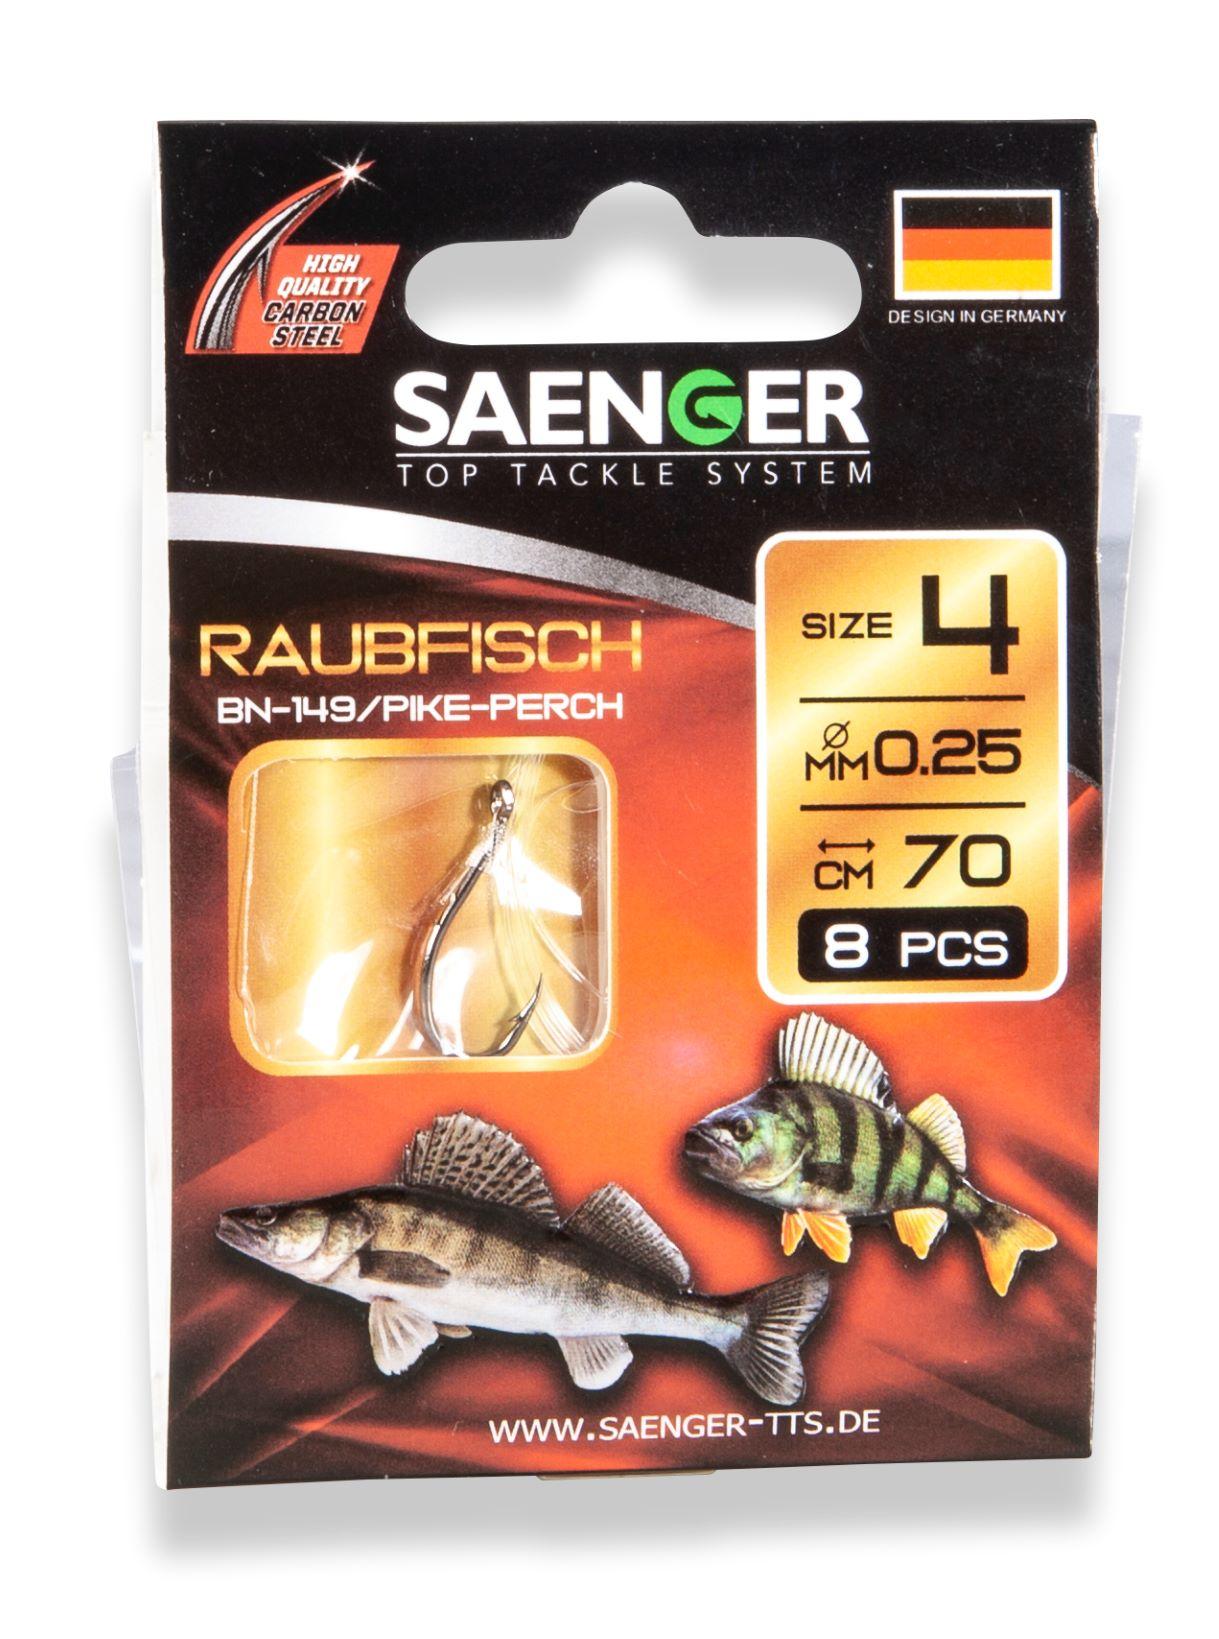 Saenger Návazec na chytání dravých ryb Raubfisch vel. 1, 8 ks/bal